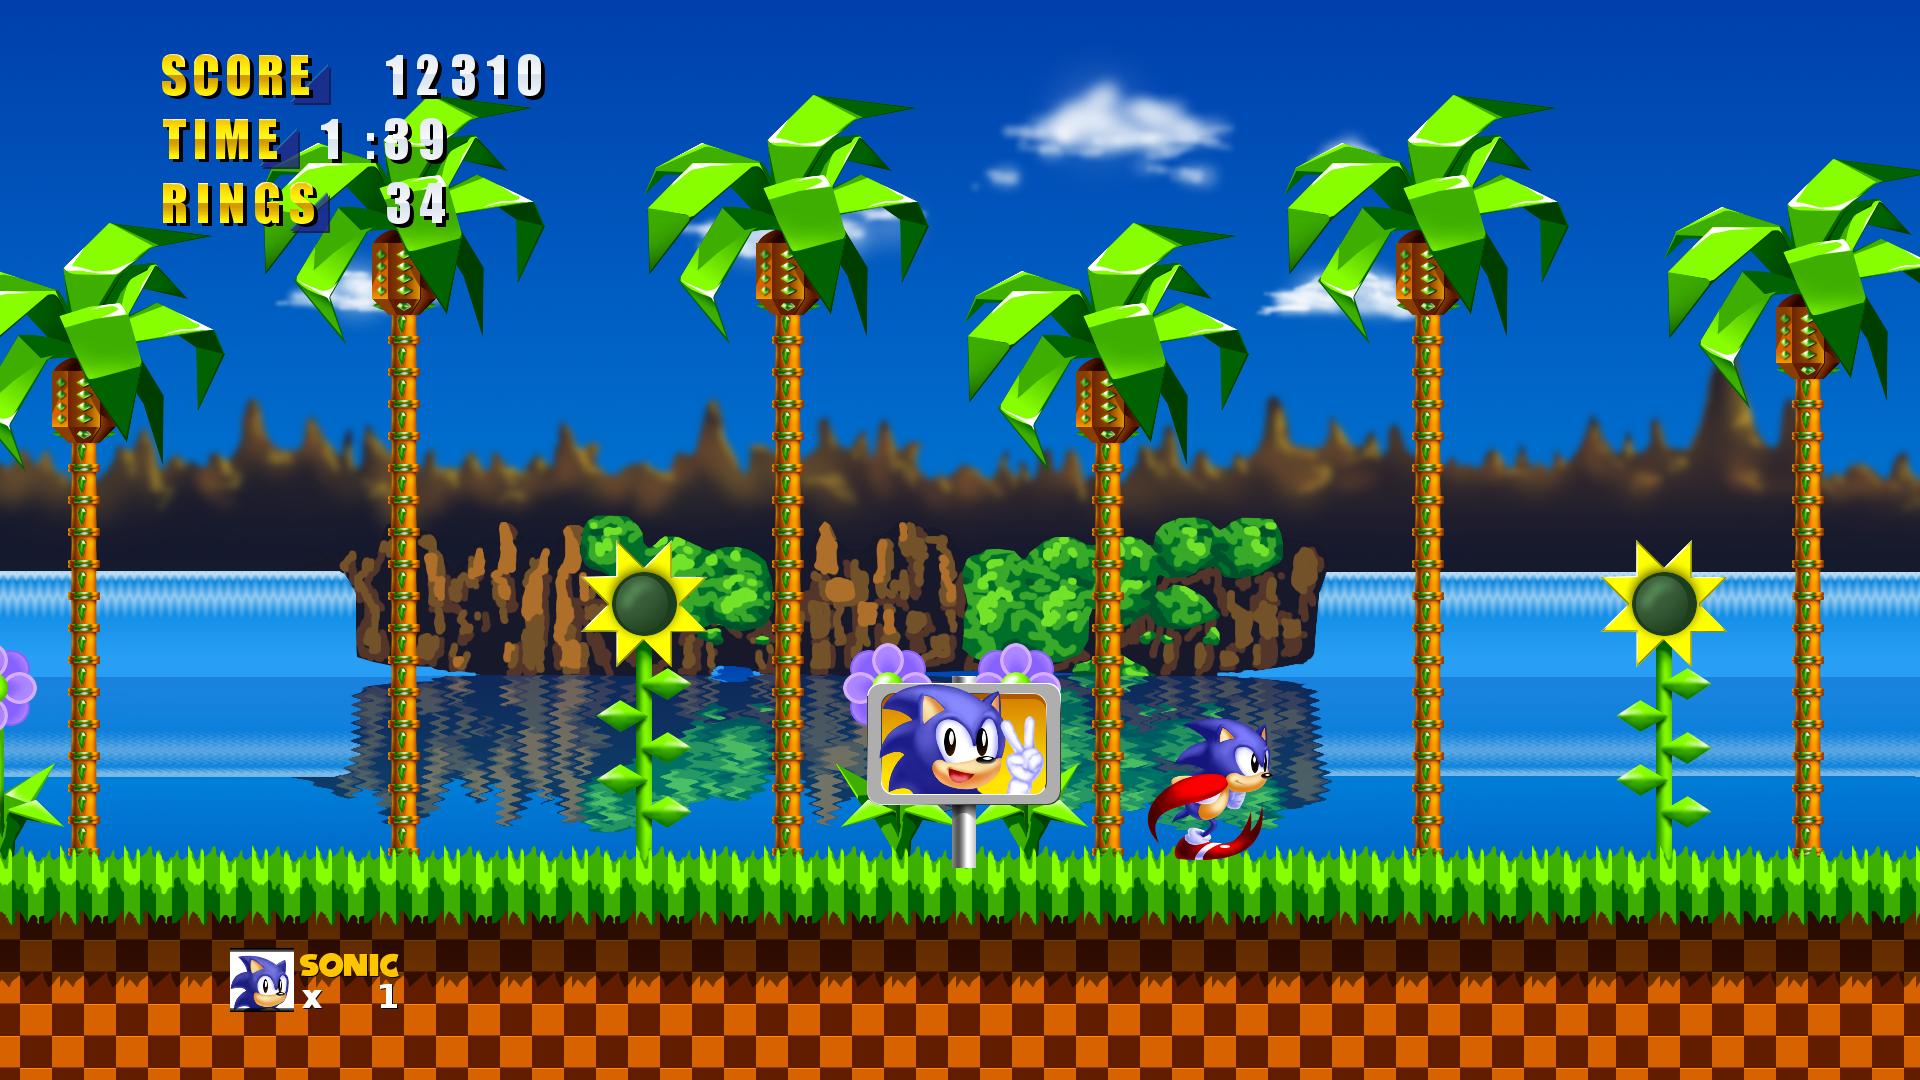 Sonic 1 HD: Green Hill Zone by Hyperchaotix